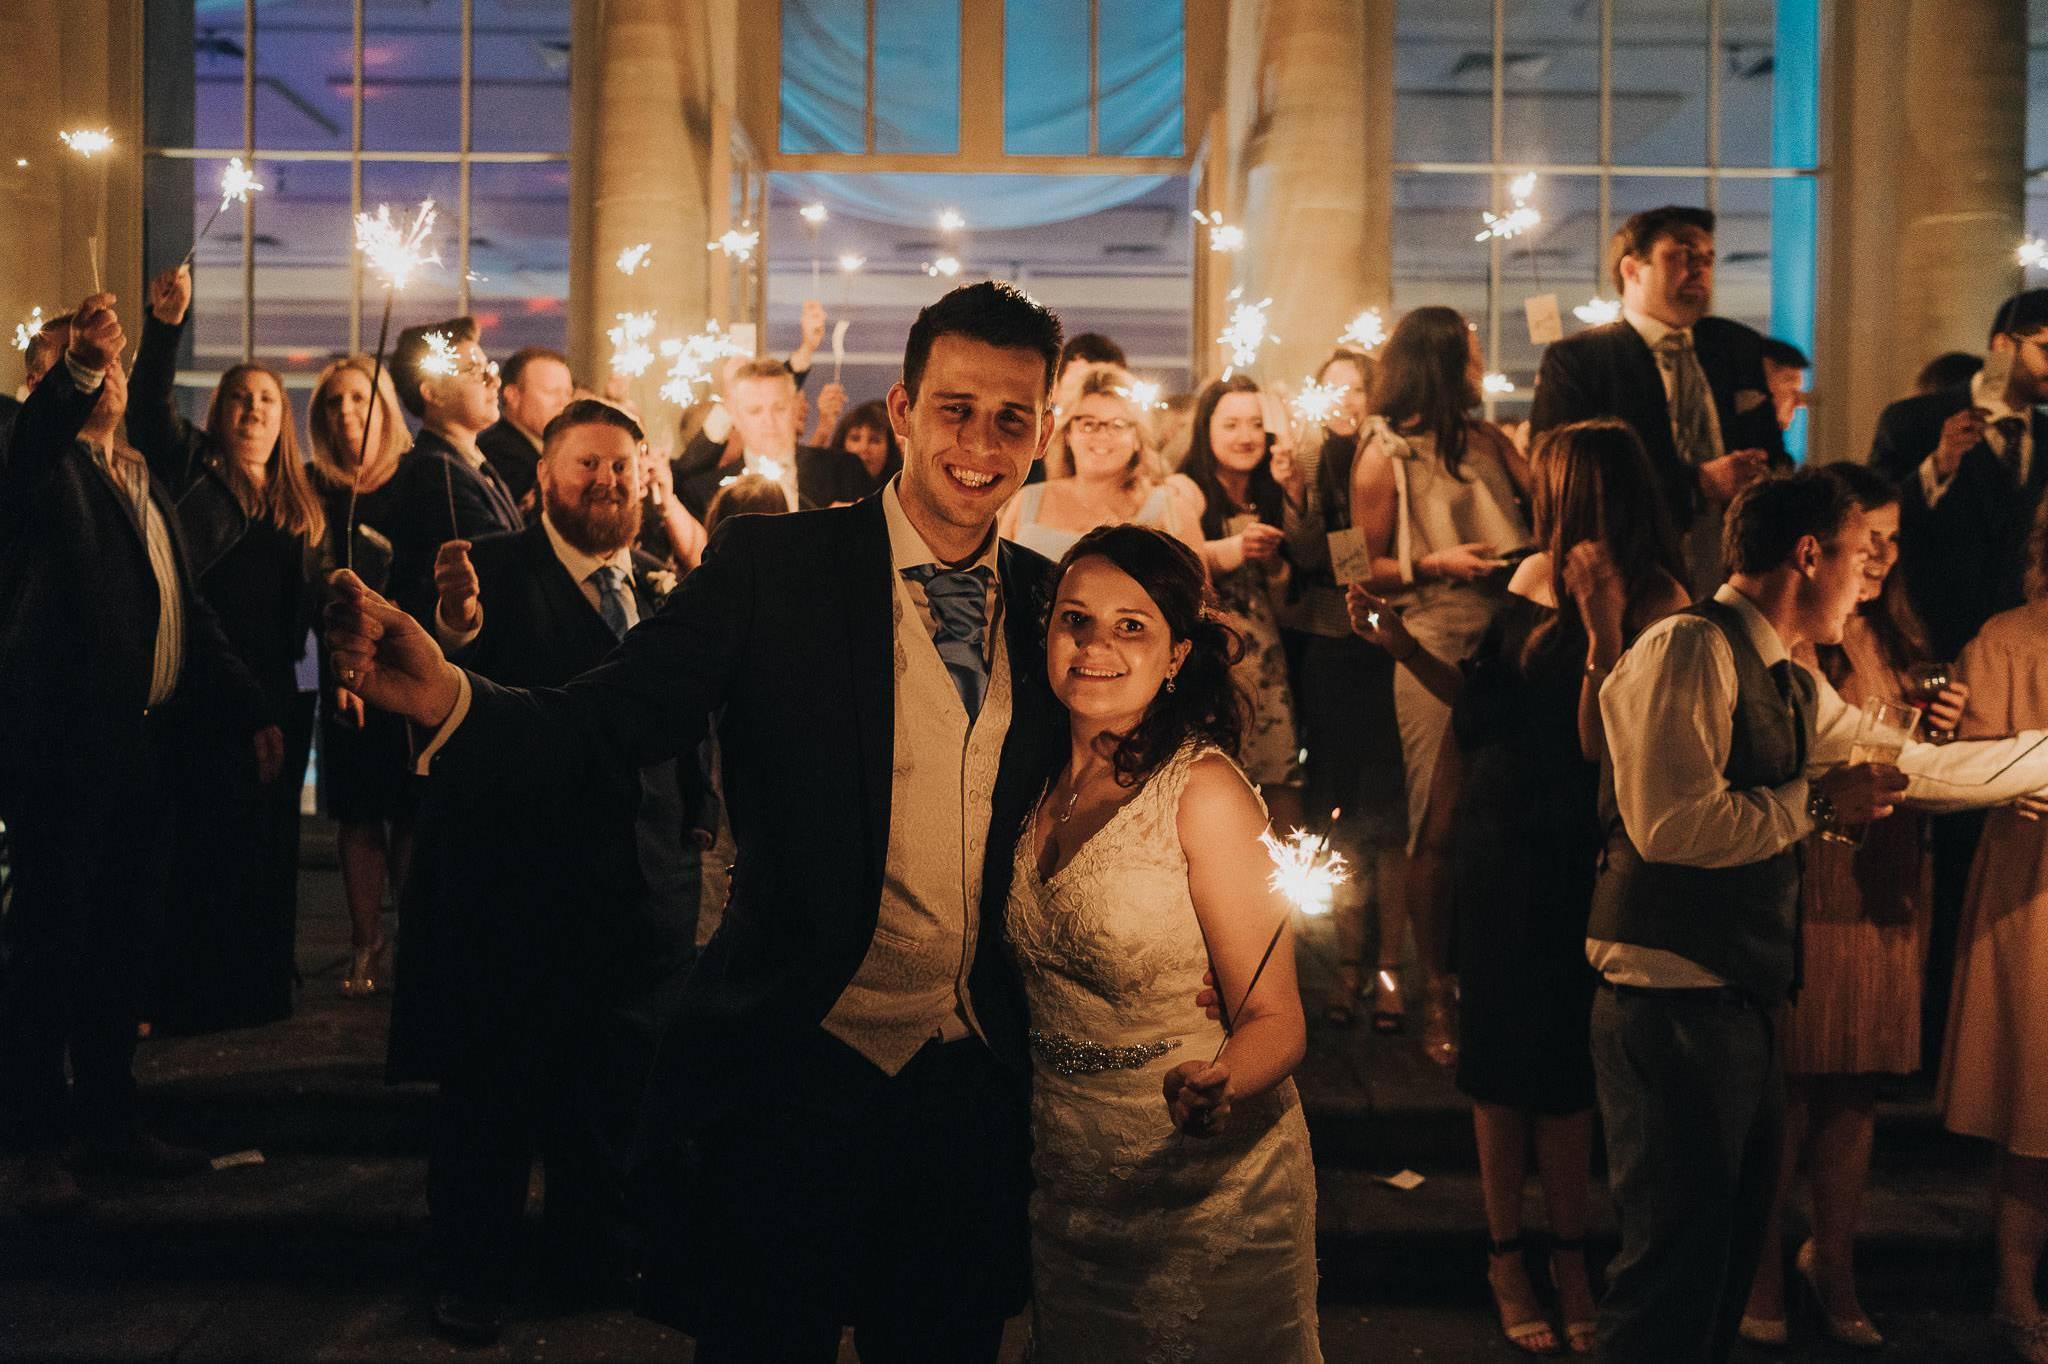 stubton-hall-wedding-photography 25.jpg